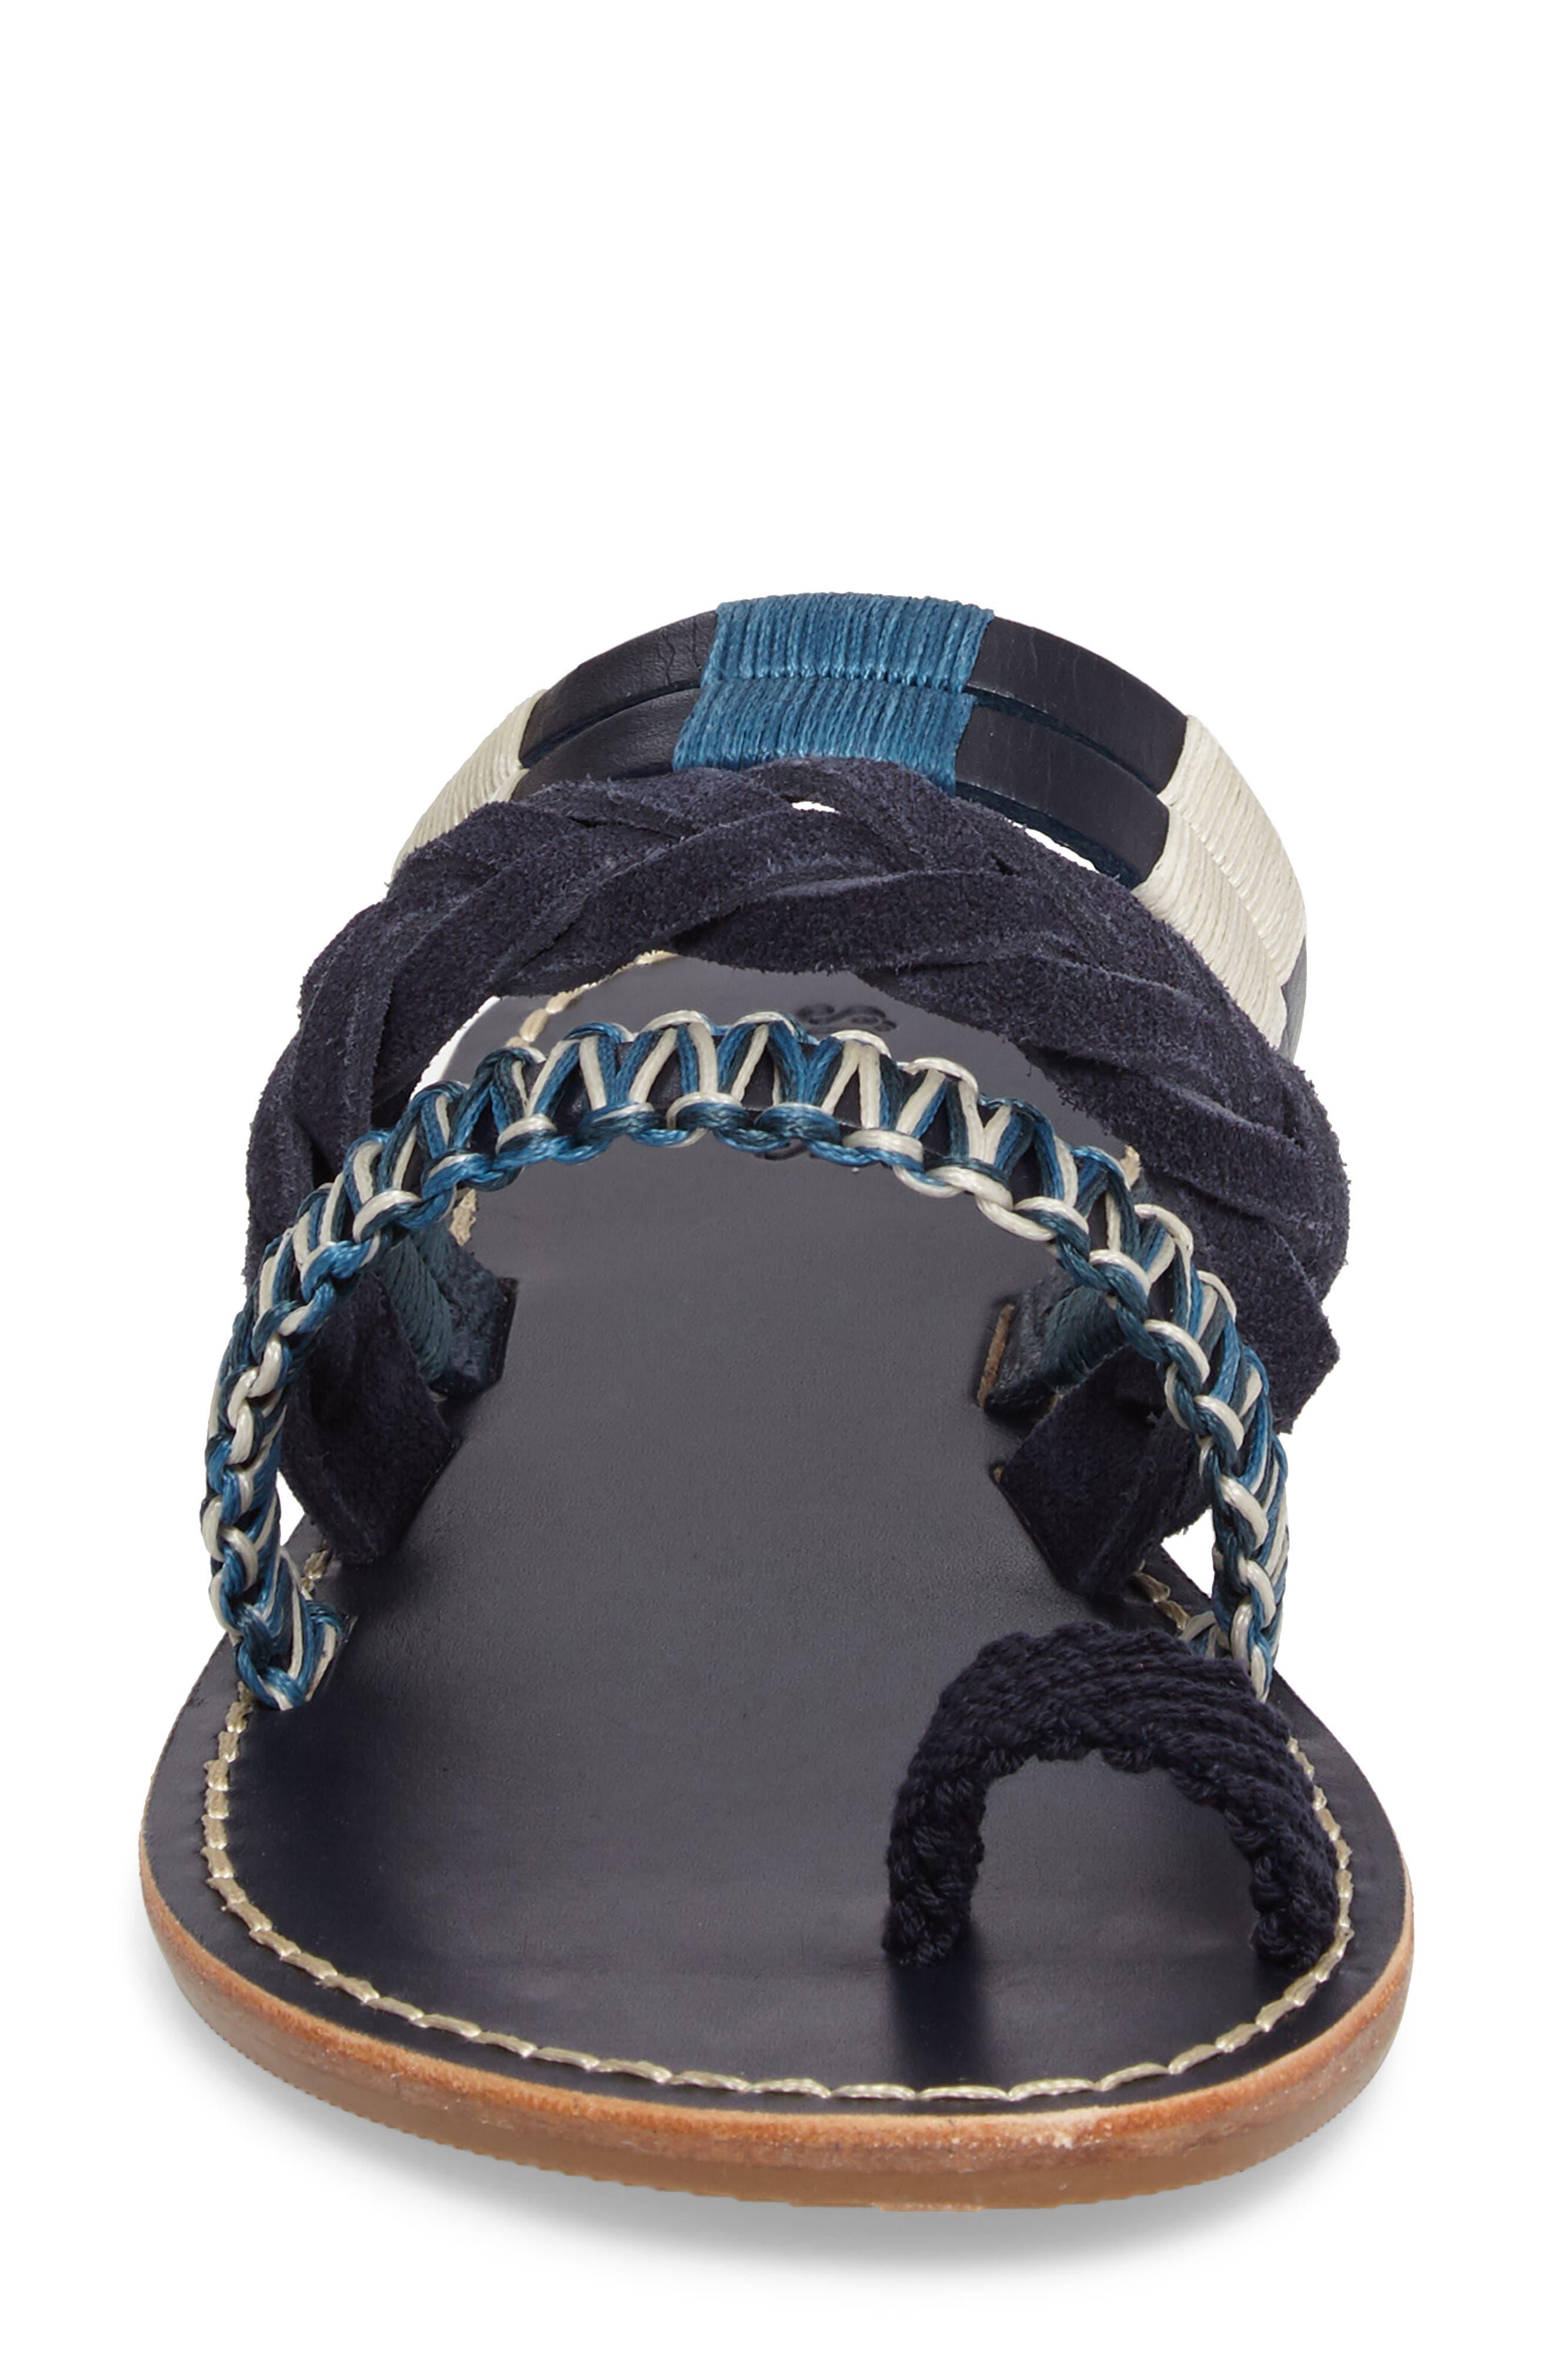 Slide Sandal,                             Alternate thumbnail 5, color,                             Midnight/ Blue Multi Leather